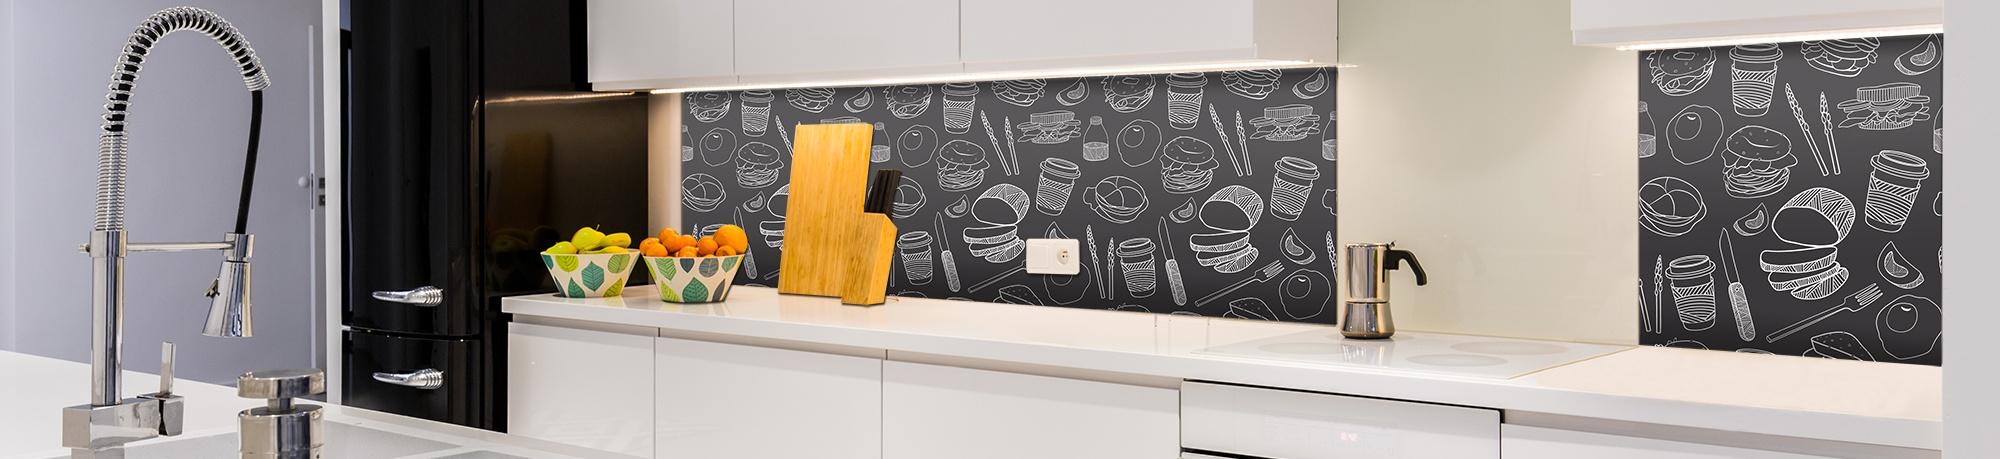 k chenr ckwand aus glas glas nach ma. Black Bedroom Furniture Sets. Home Design Ideas